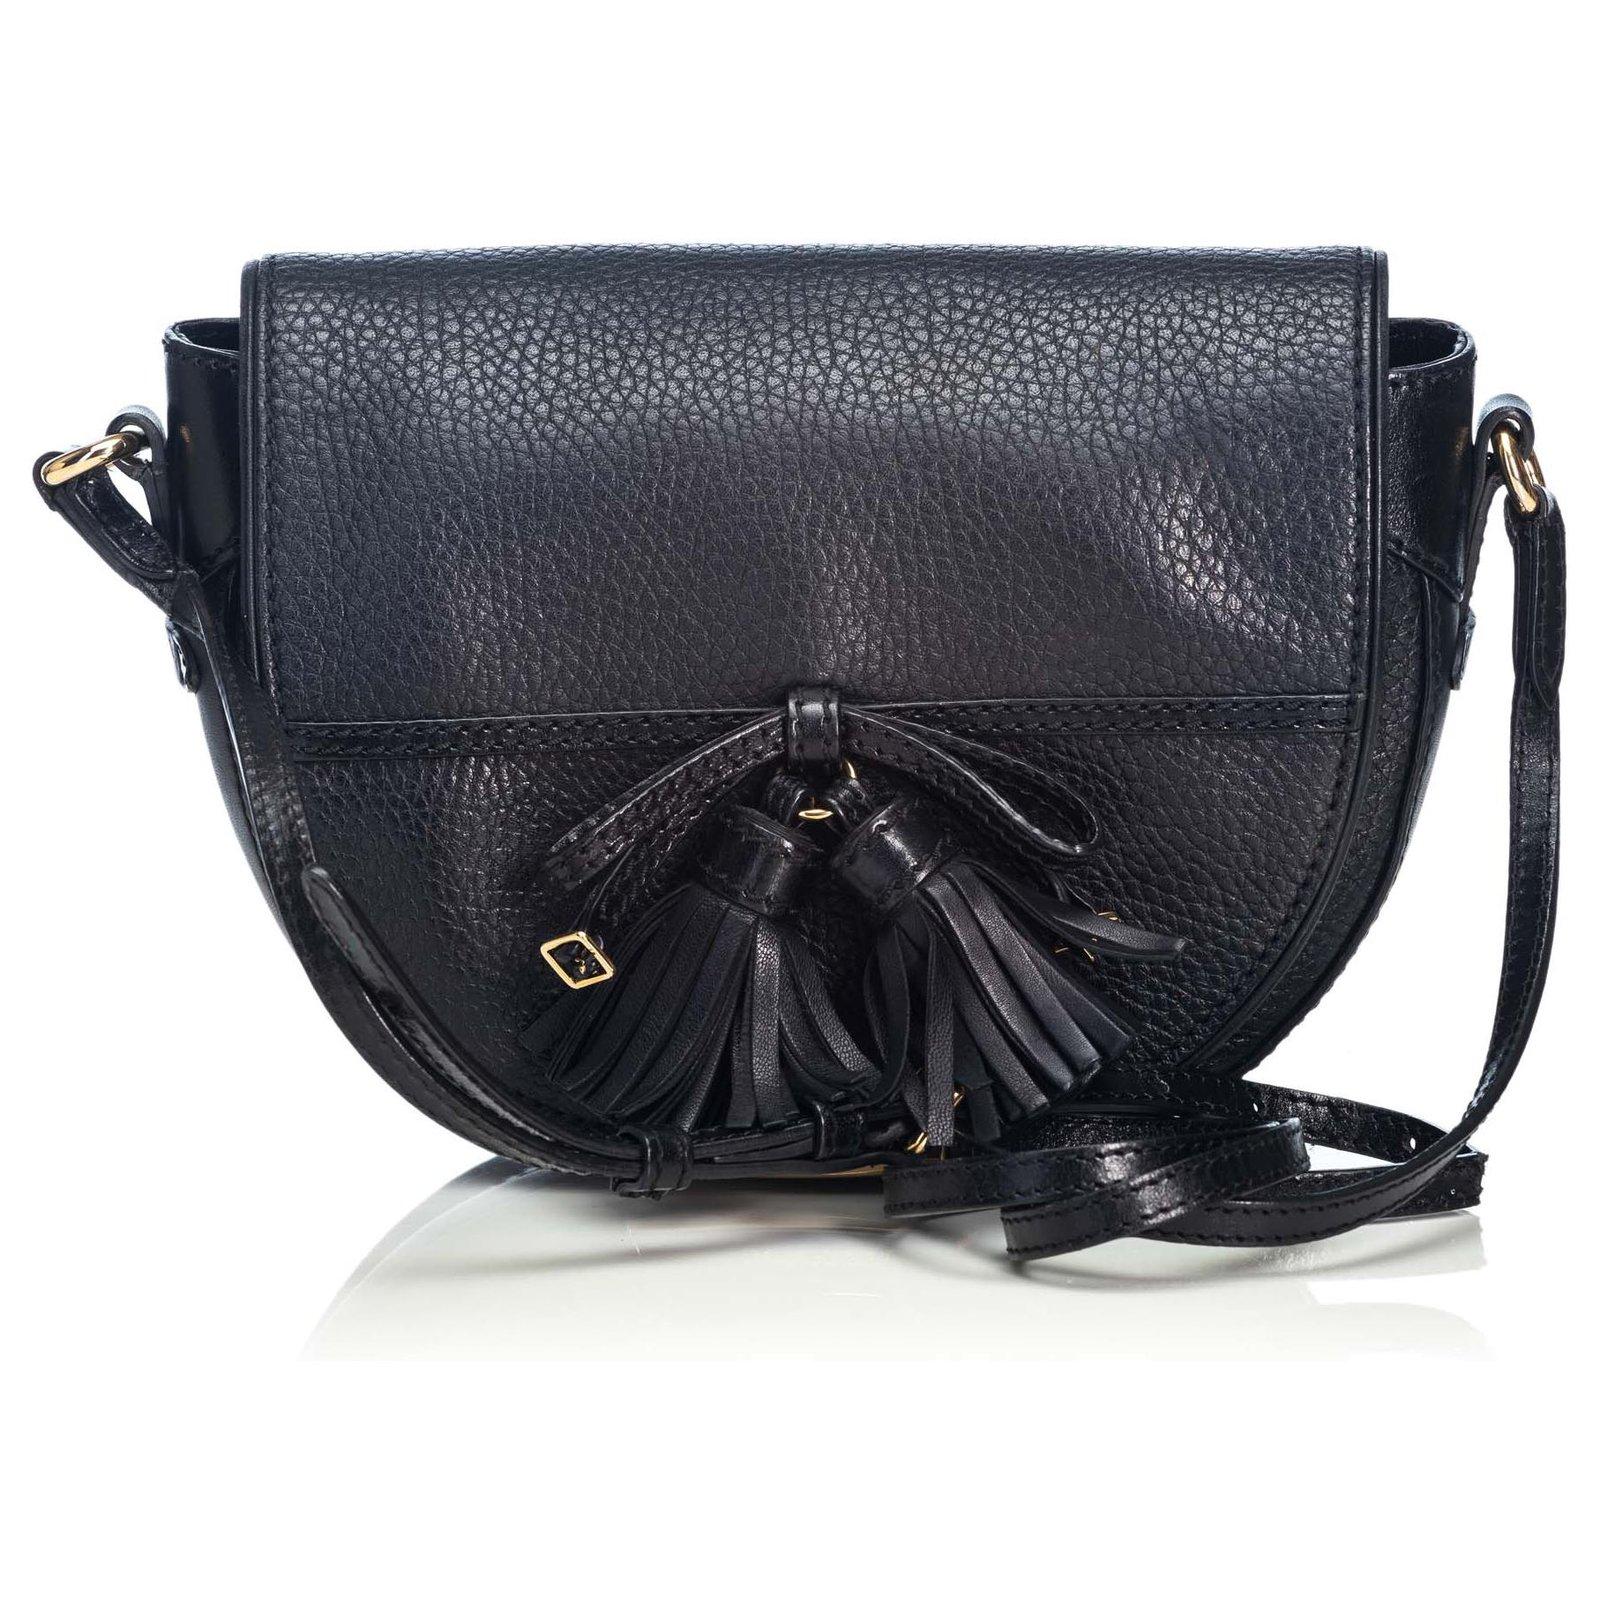 ebec84839 Burberry Burberry Black Leather Crossbody Bag Handbags Leather,Other Black  ref.123953